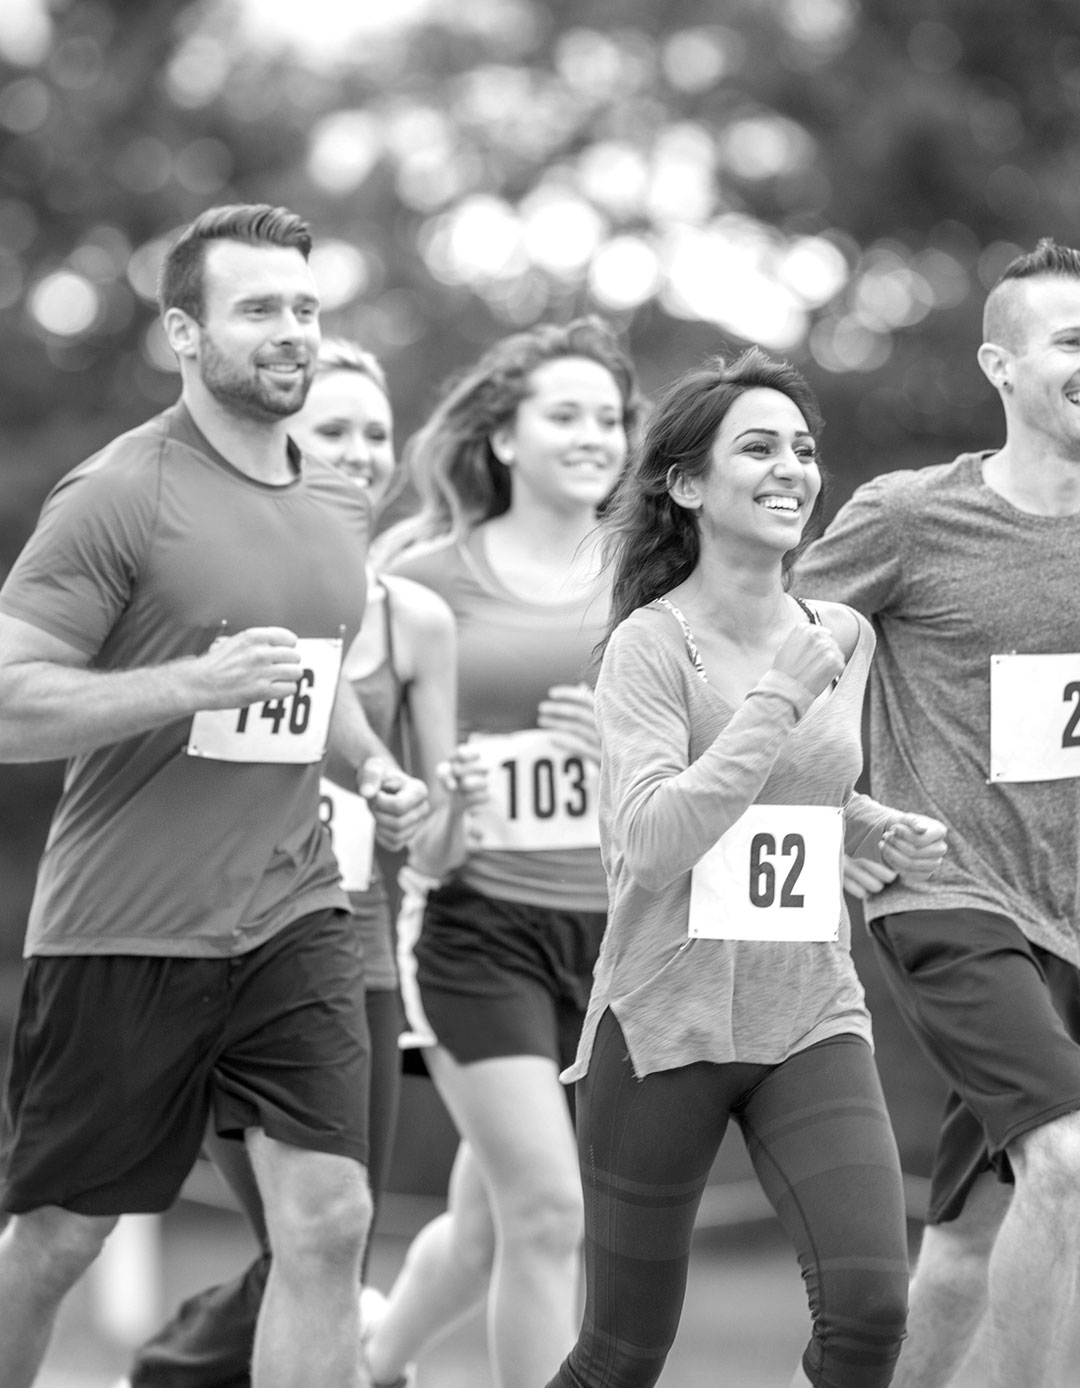 joggere i maraton